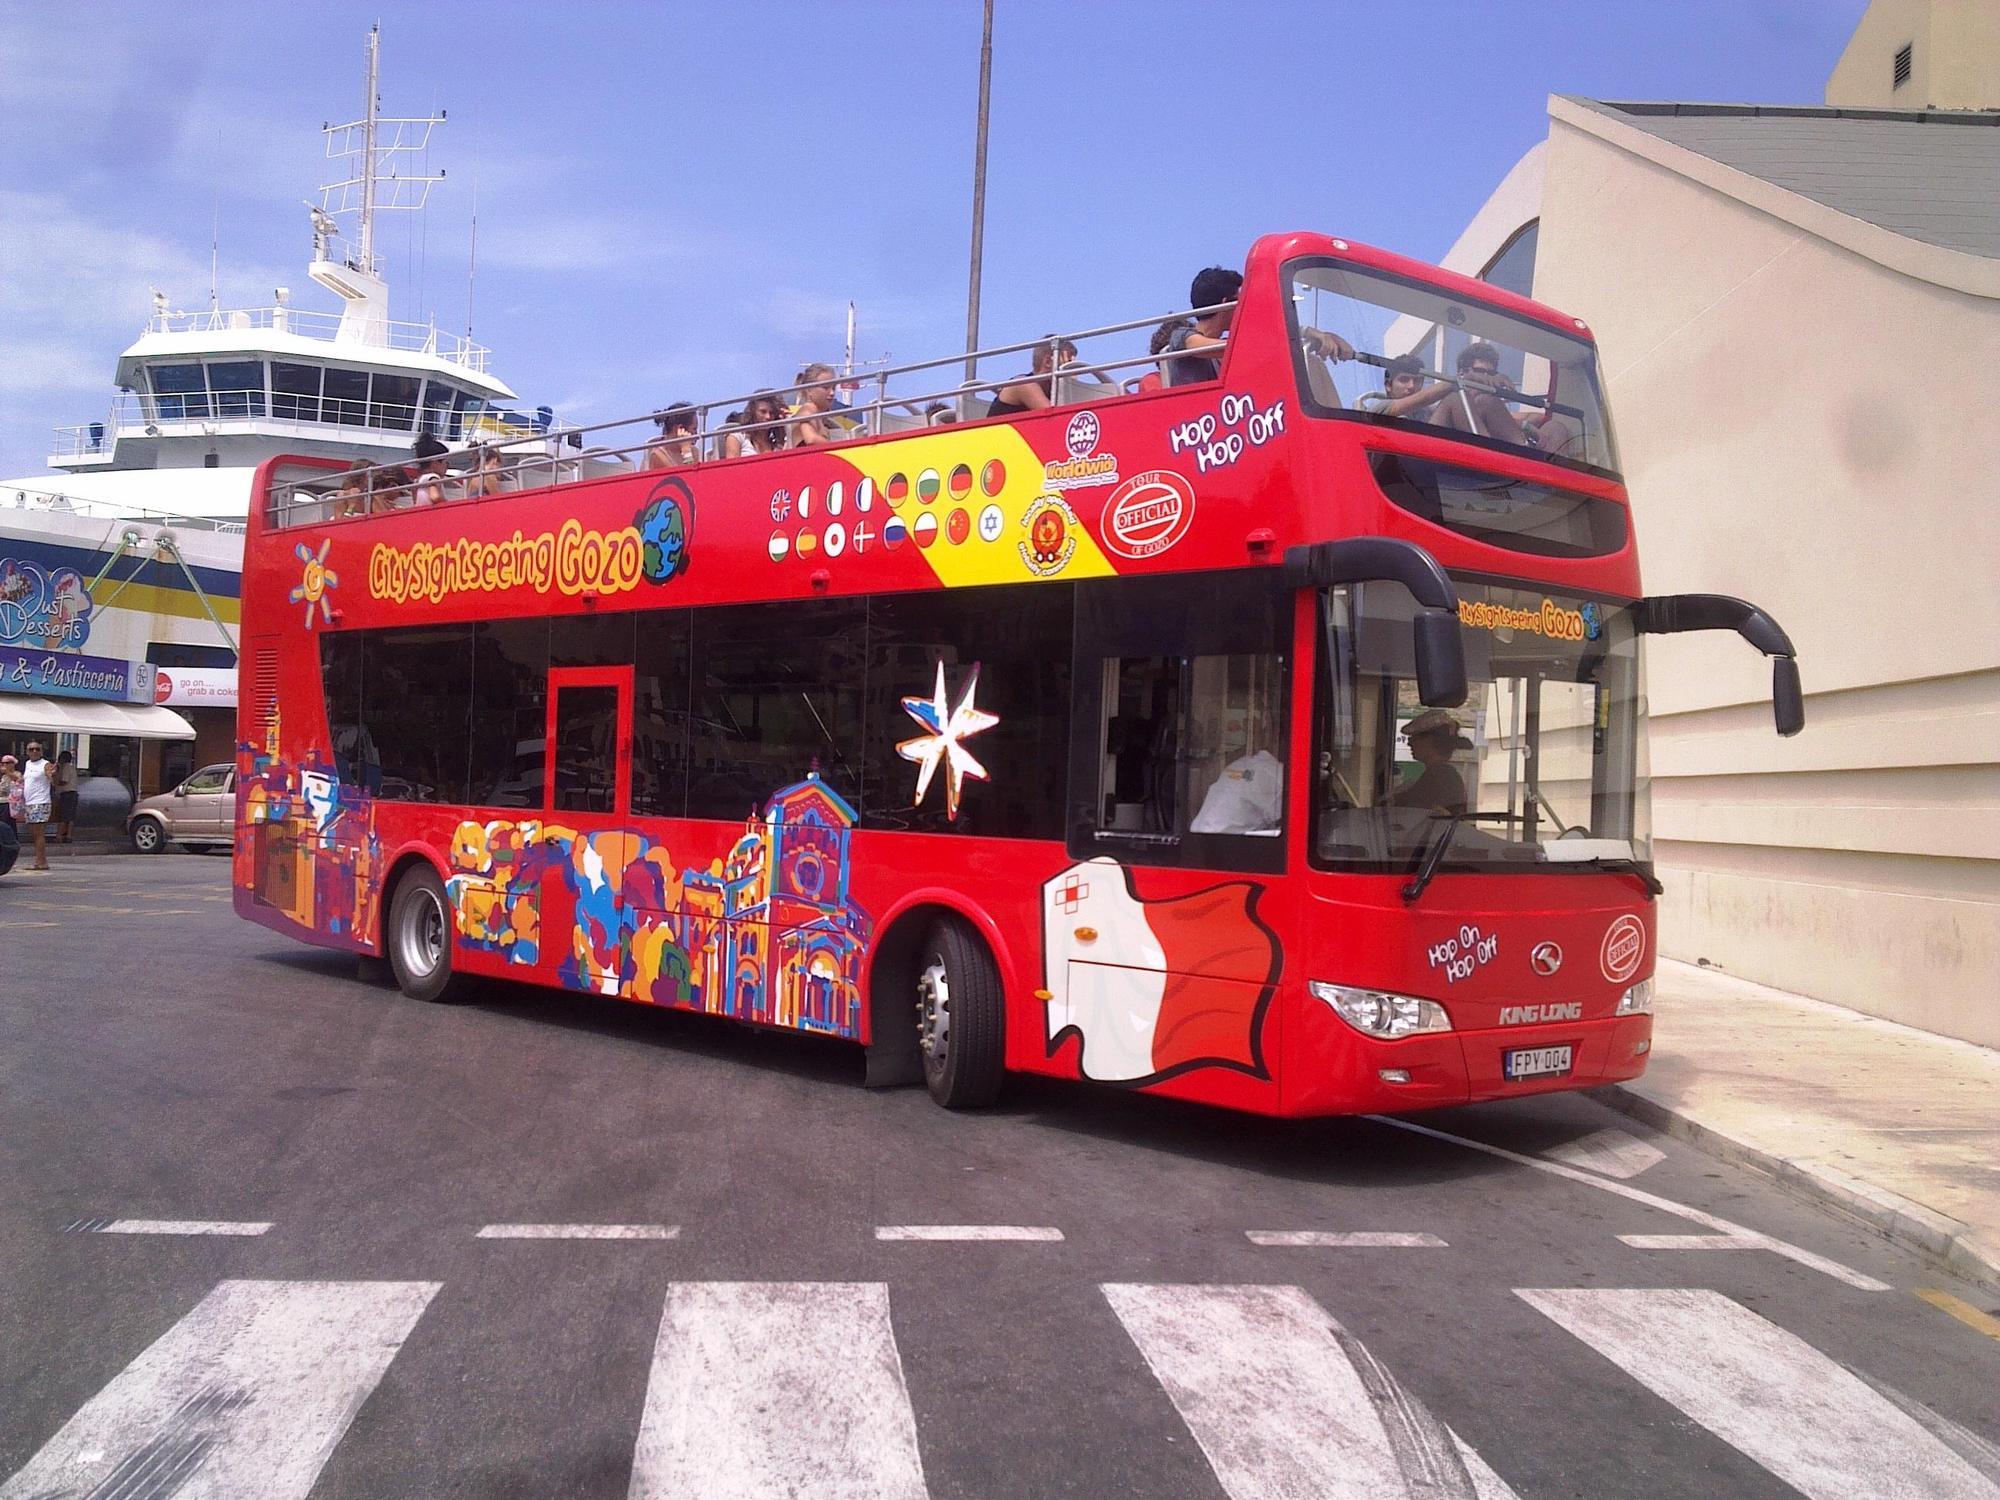 Bustour - Home Facebook